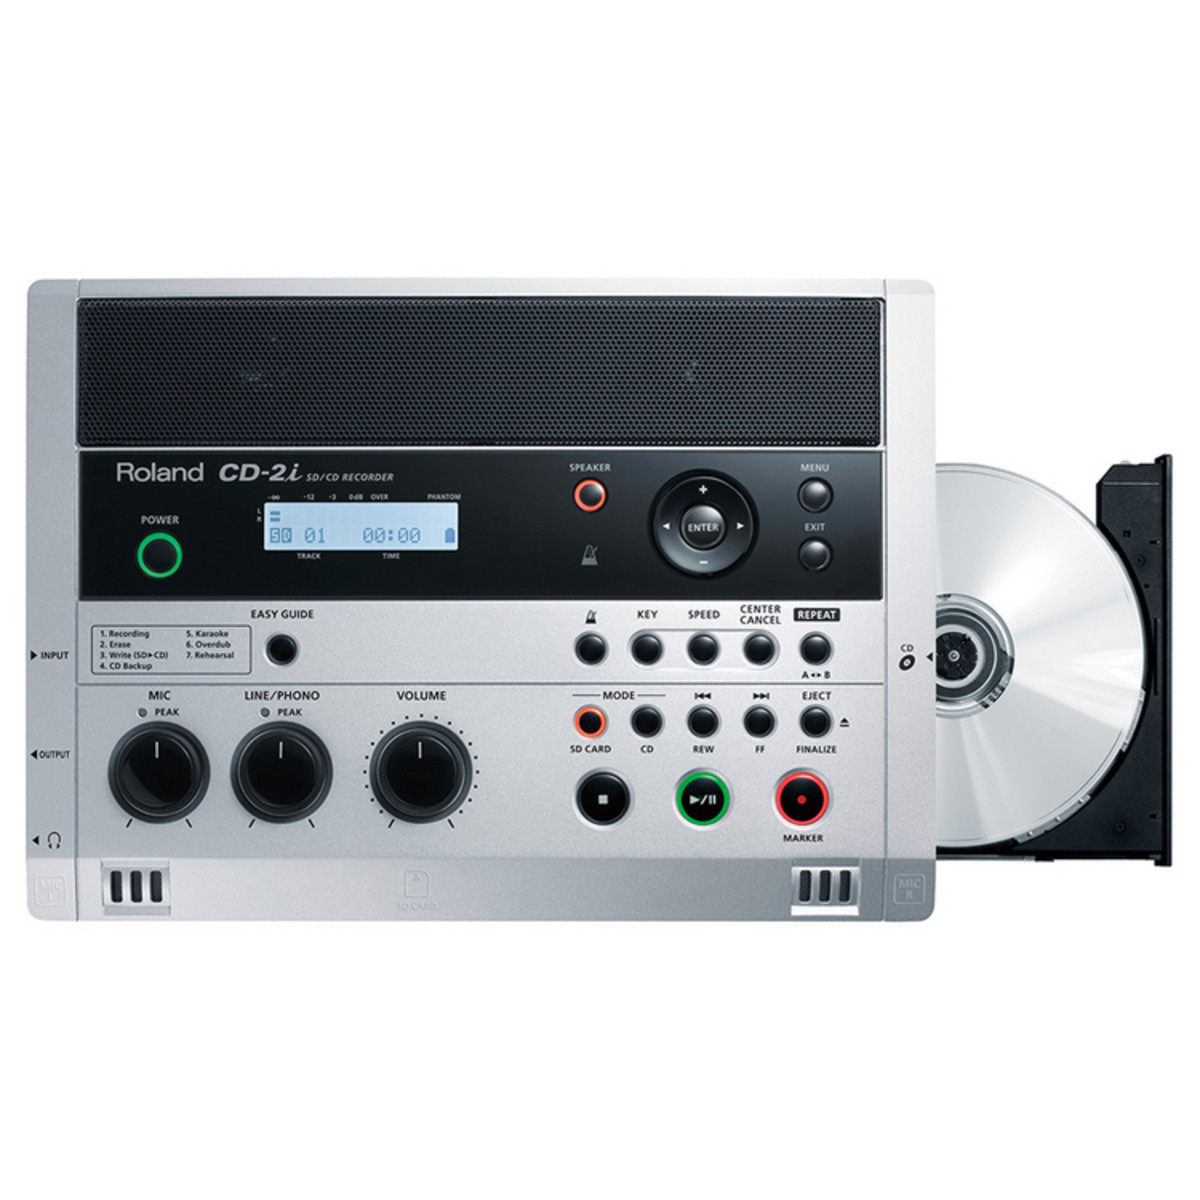 Roland cd 2i sd cd portable audio recorder at - Mobile porta cd ...